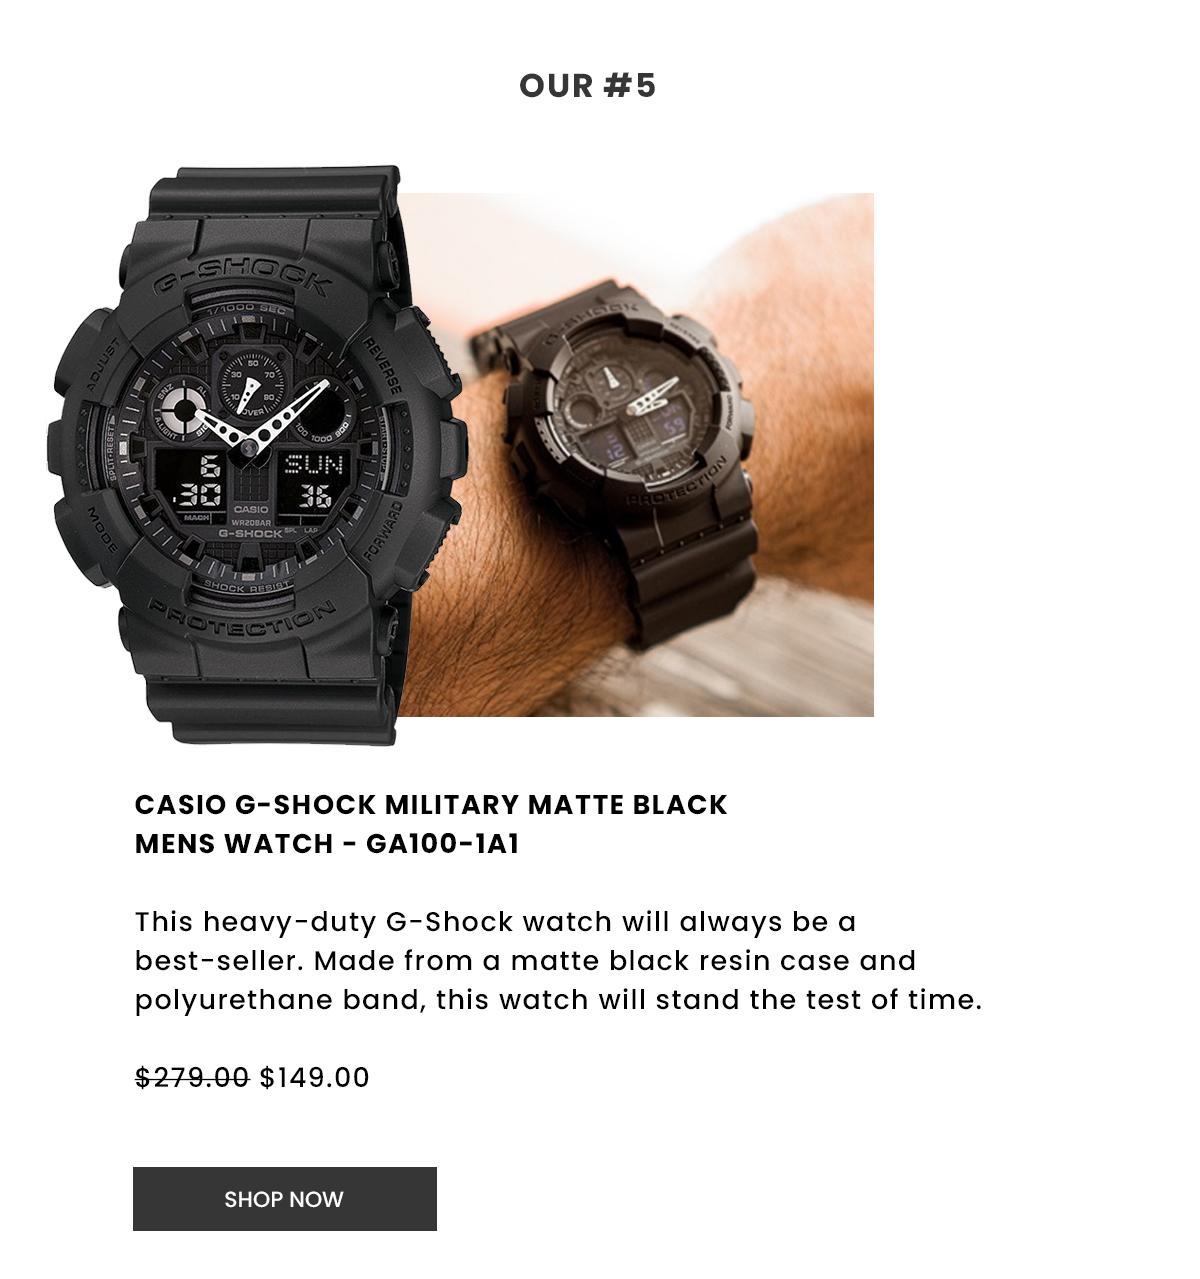 Casio G-Shock Military Matte Black Mens Watch - Ga100-1A1. Shop Now.